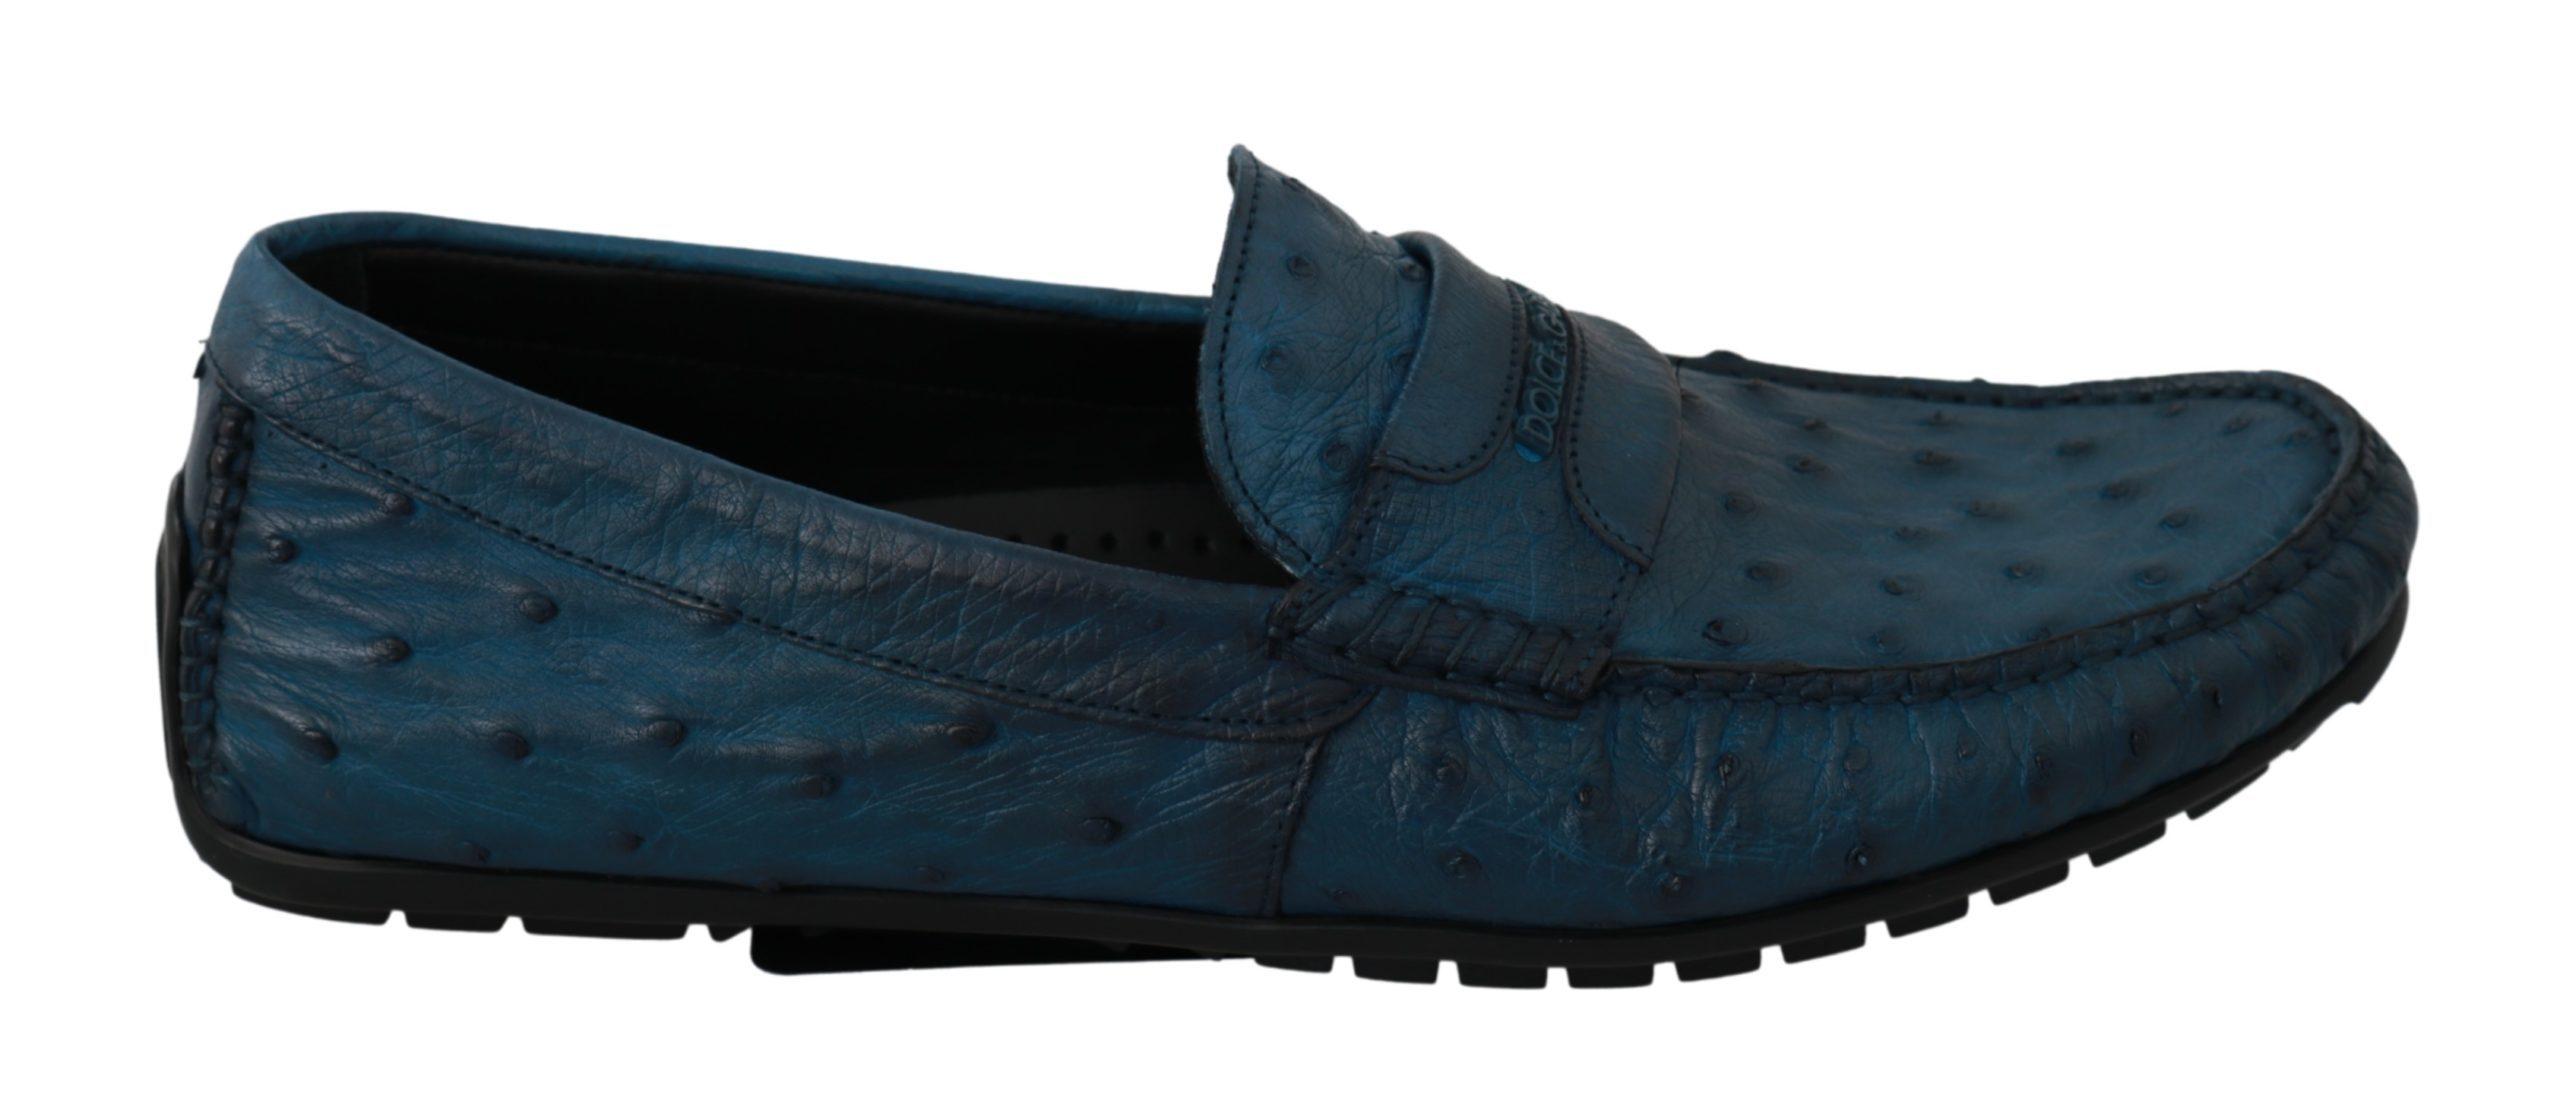 Dolce & Gabbana Men's Flat Skin Leather Loafer Blue MV2689 - EU40/US7